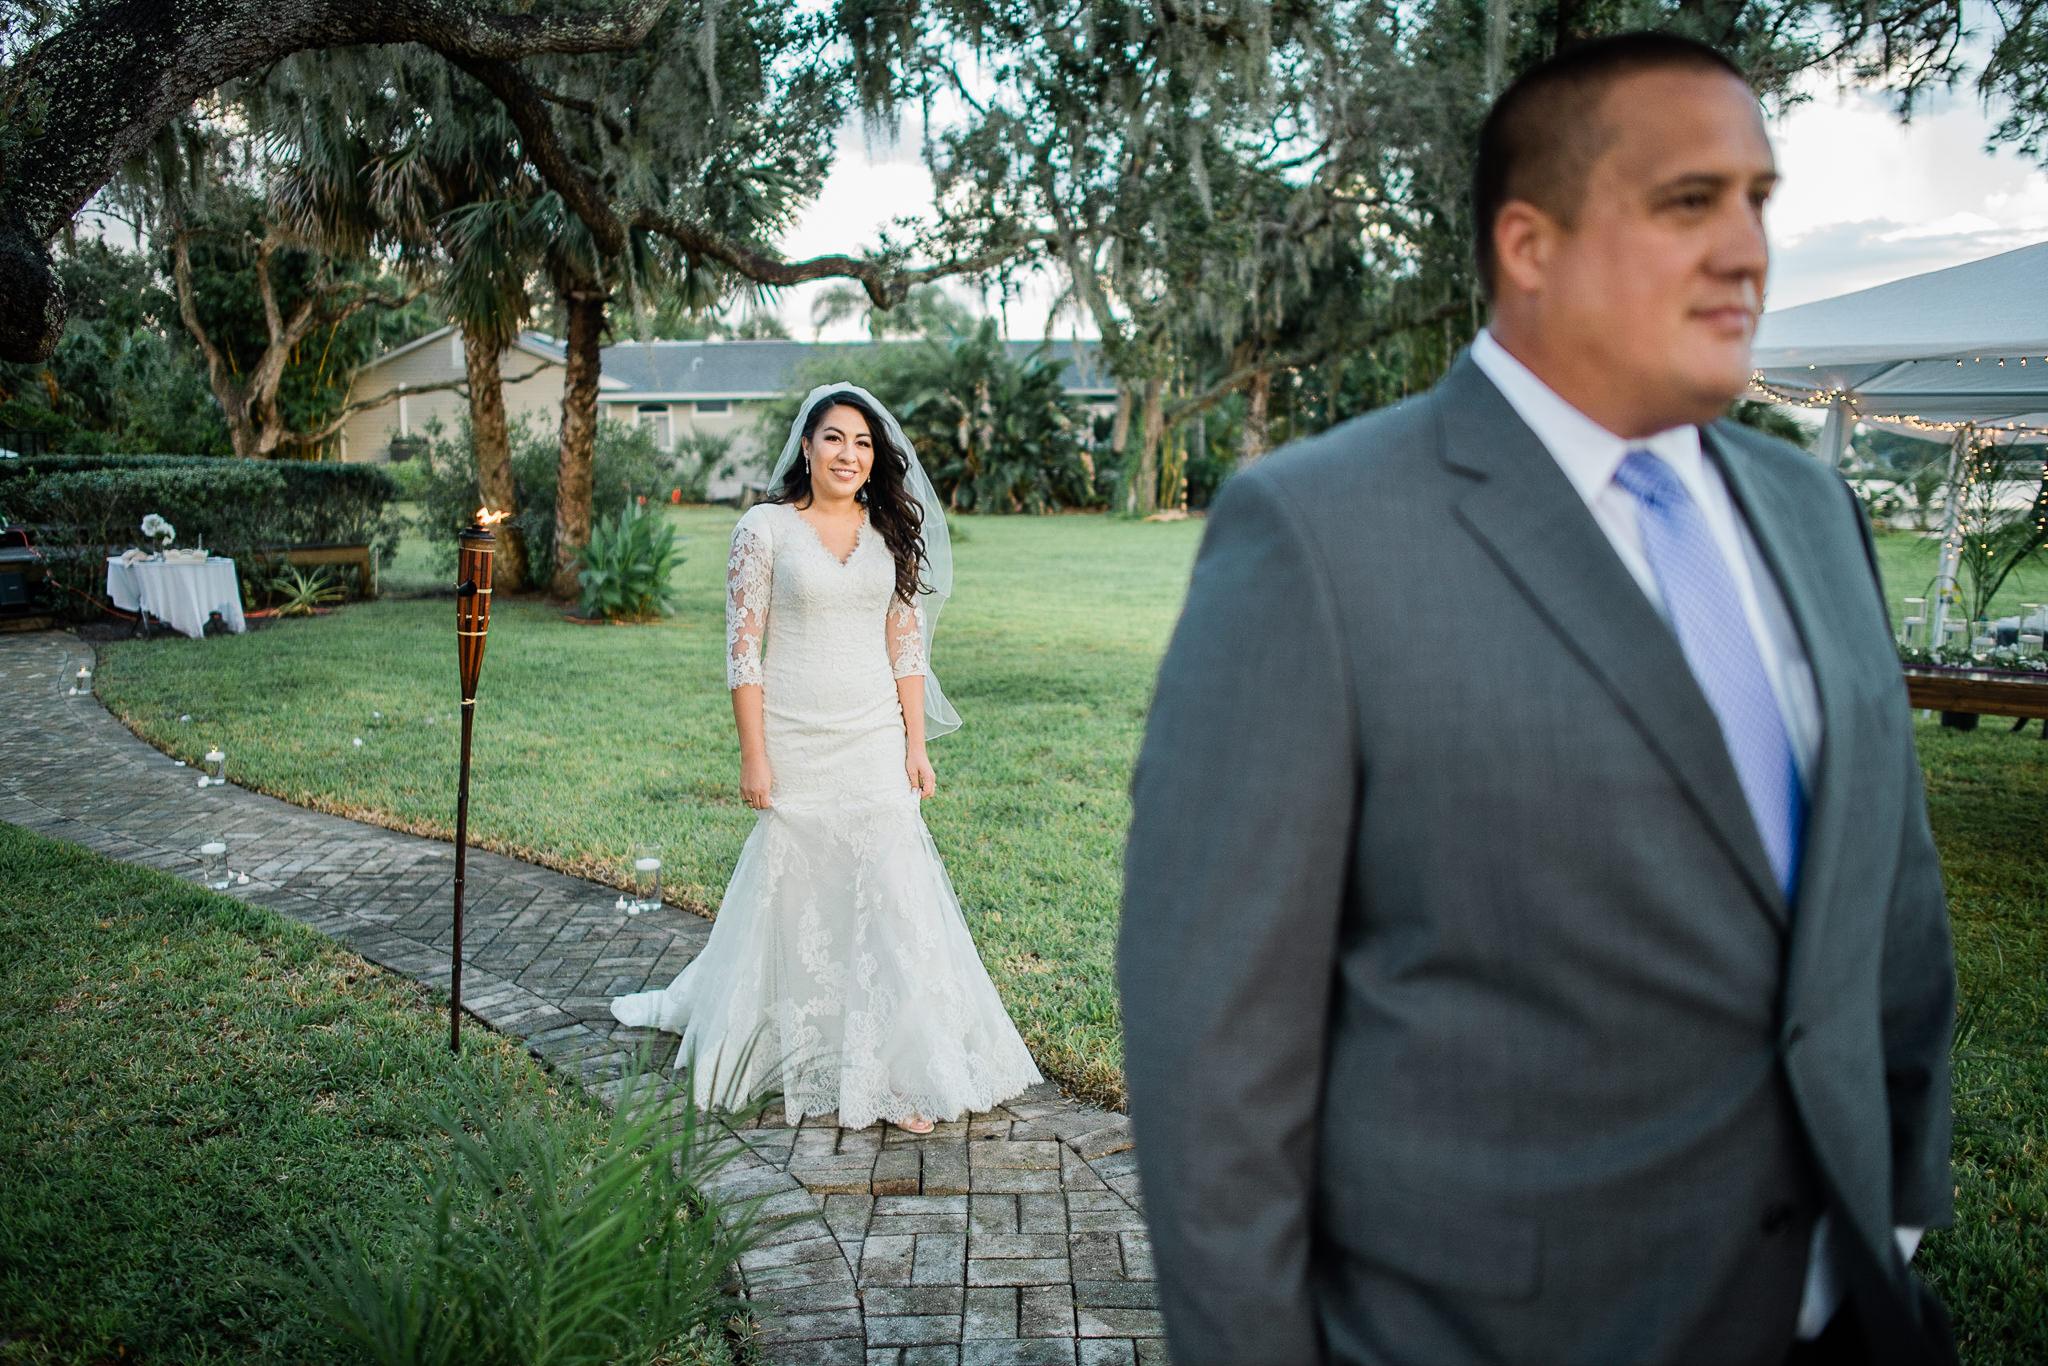 TAMPA_WEDDING_PHOTOGRAPHER_AAMZ_4334.jpg